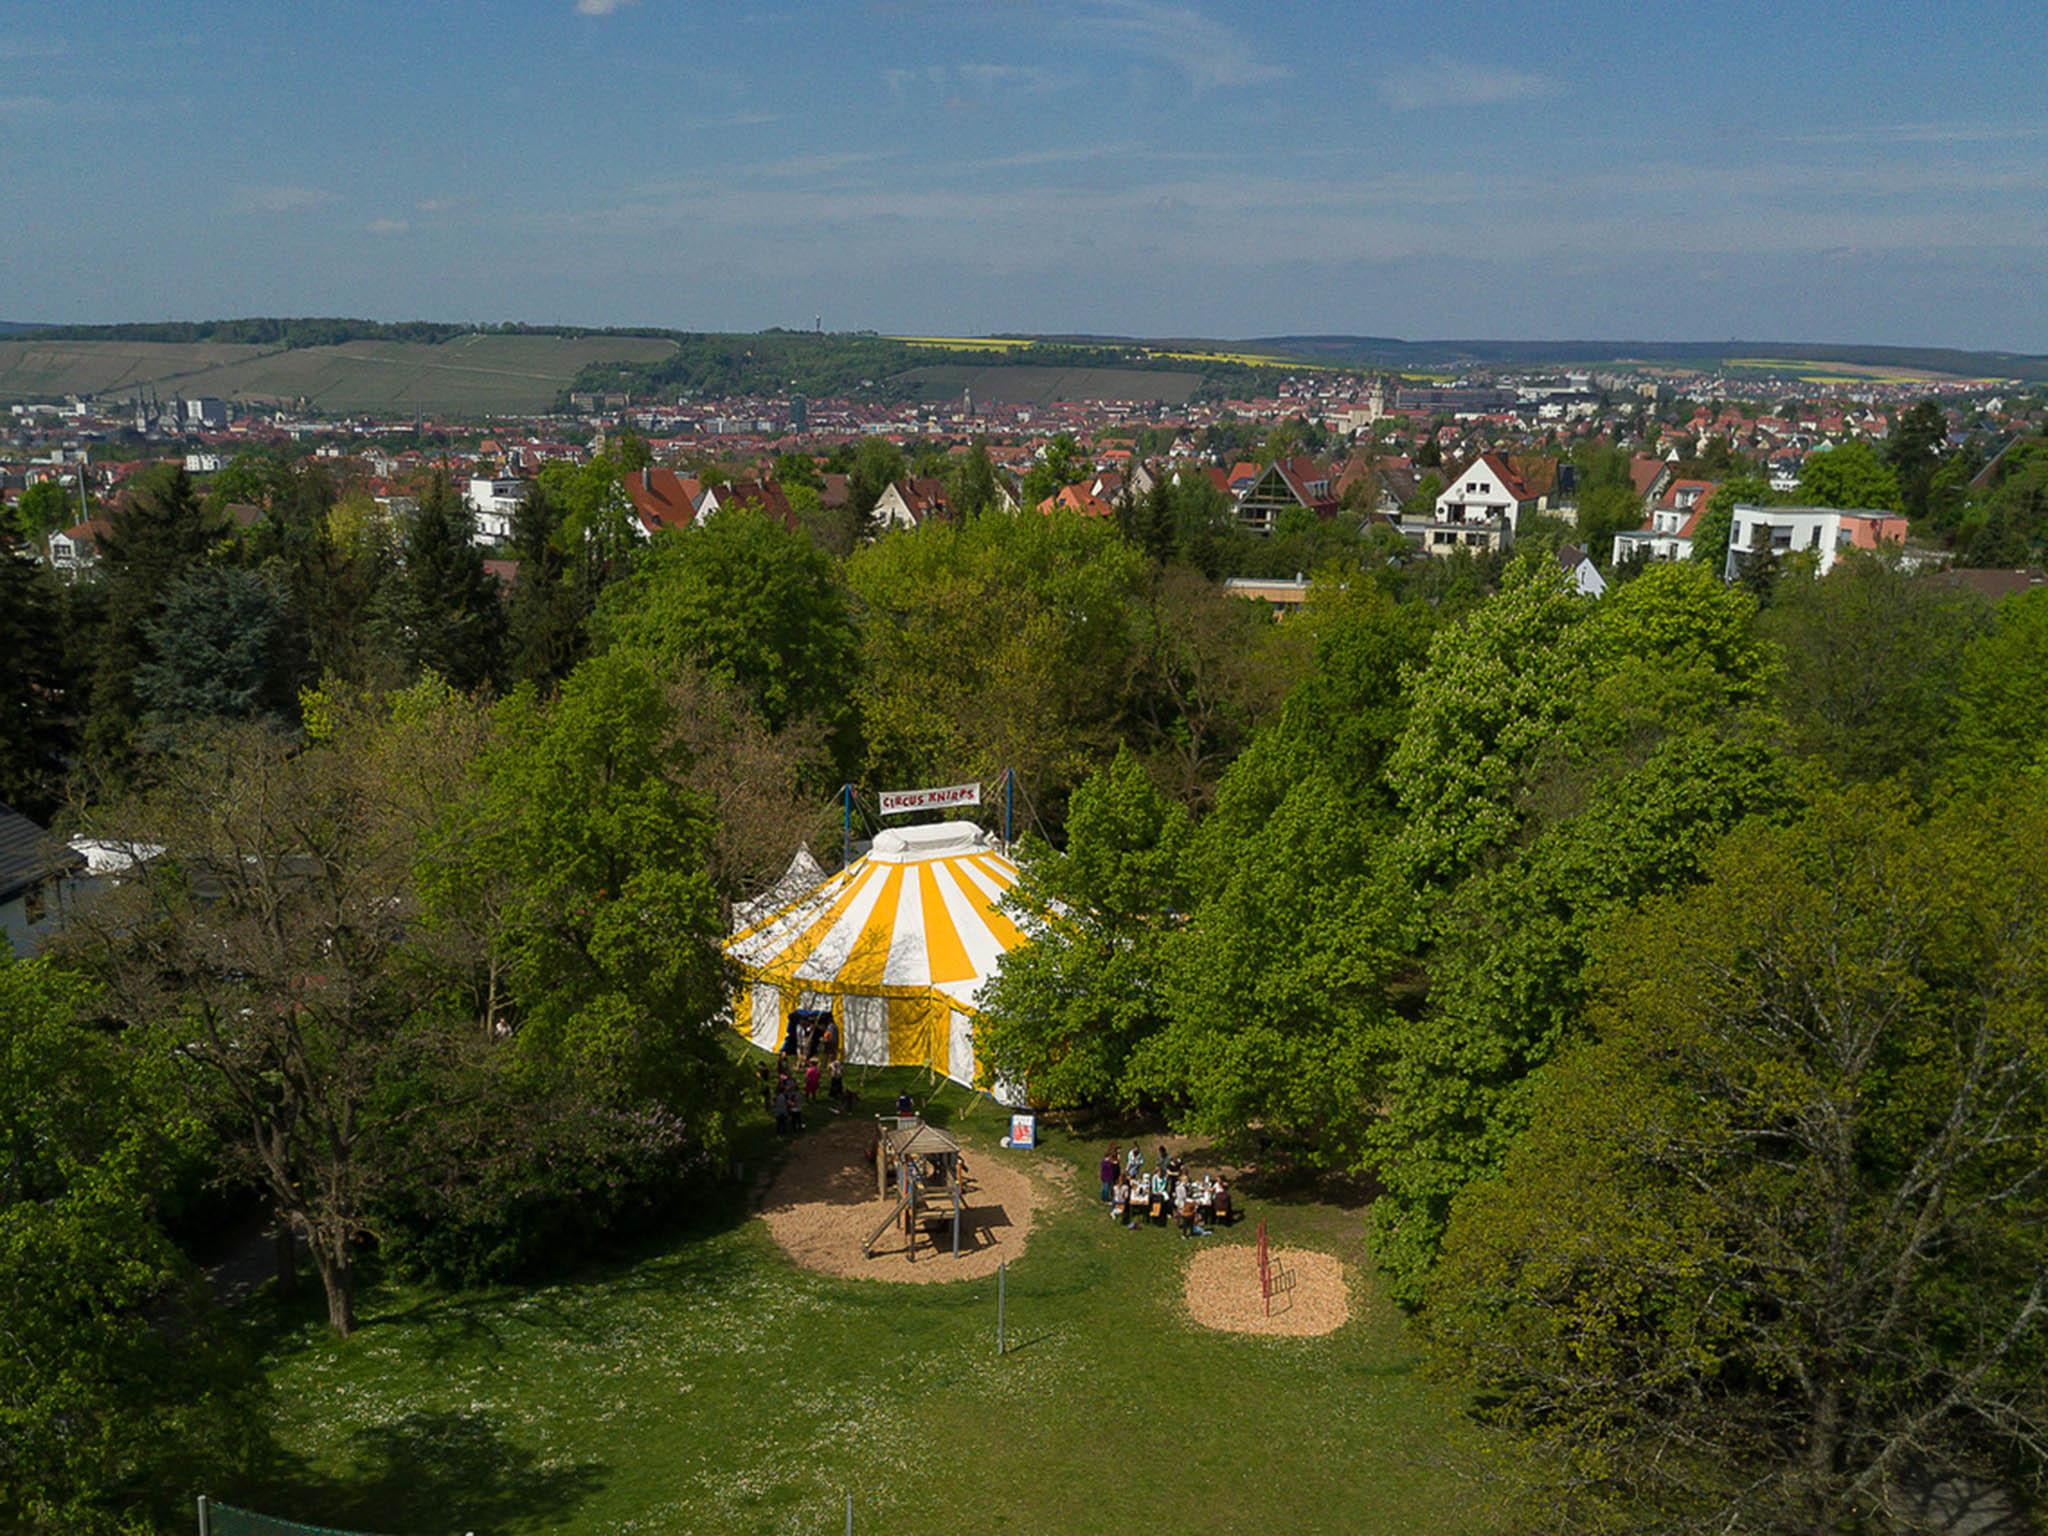 Das Zirkuszelt des Circus Knirps im Frauenland. Foto: Büro 71a.